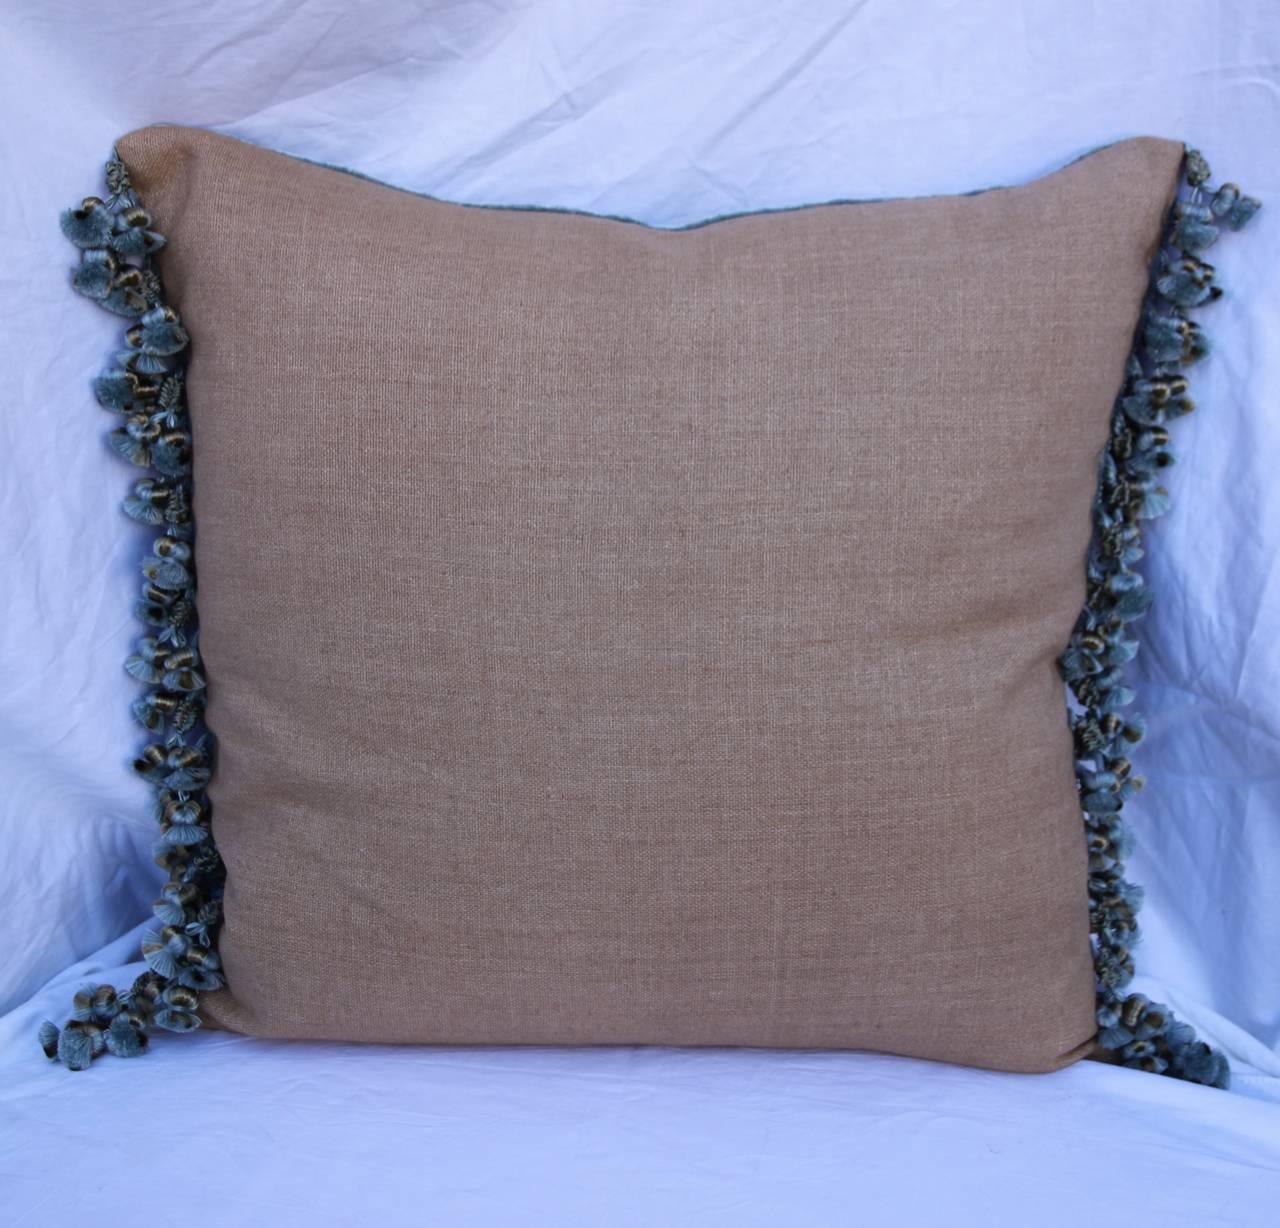 Appliqué 19th Century French Lace Appliqued Pillow For Sale